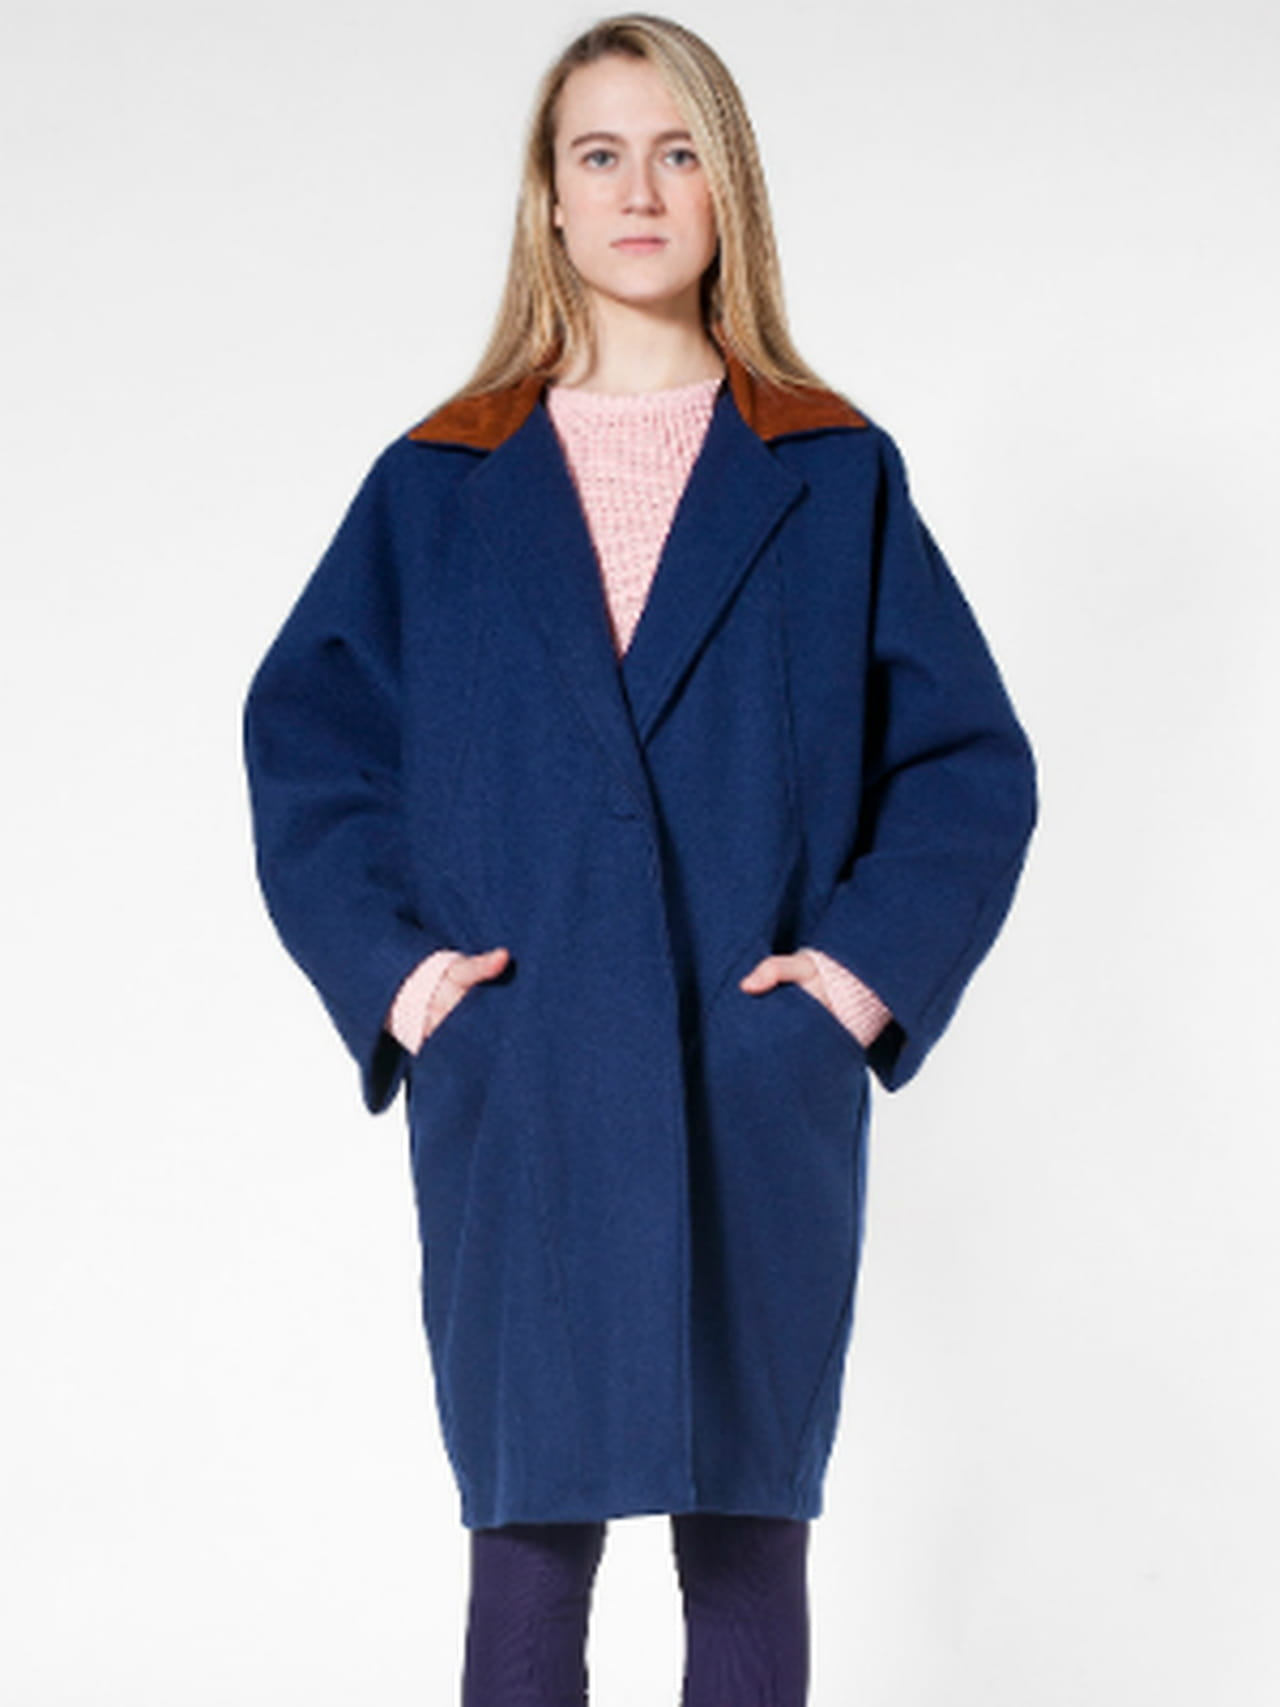 1dca3f6341da 10192640-300x400-american-apparel-manteau-laine-bleu-et-camel-215.jpg